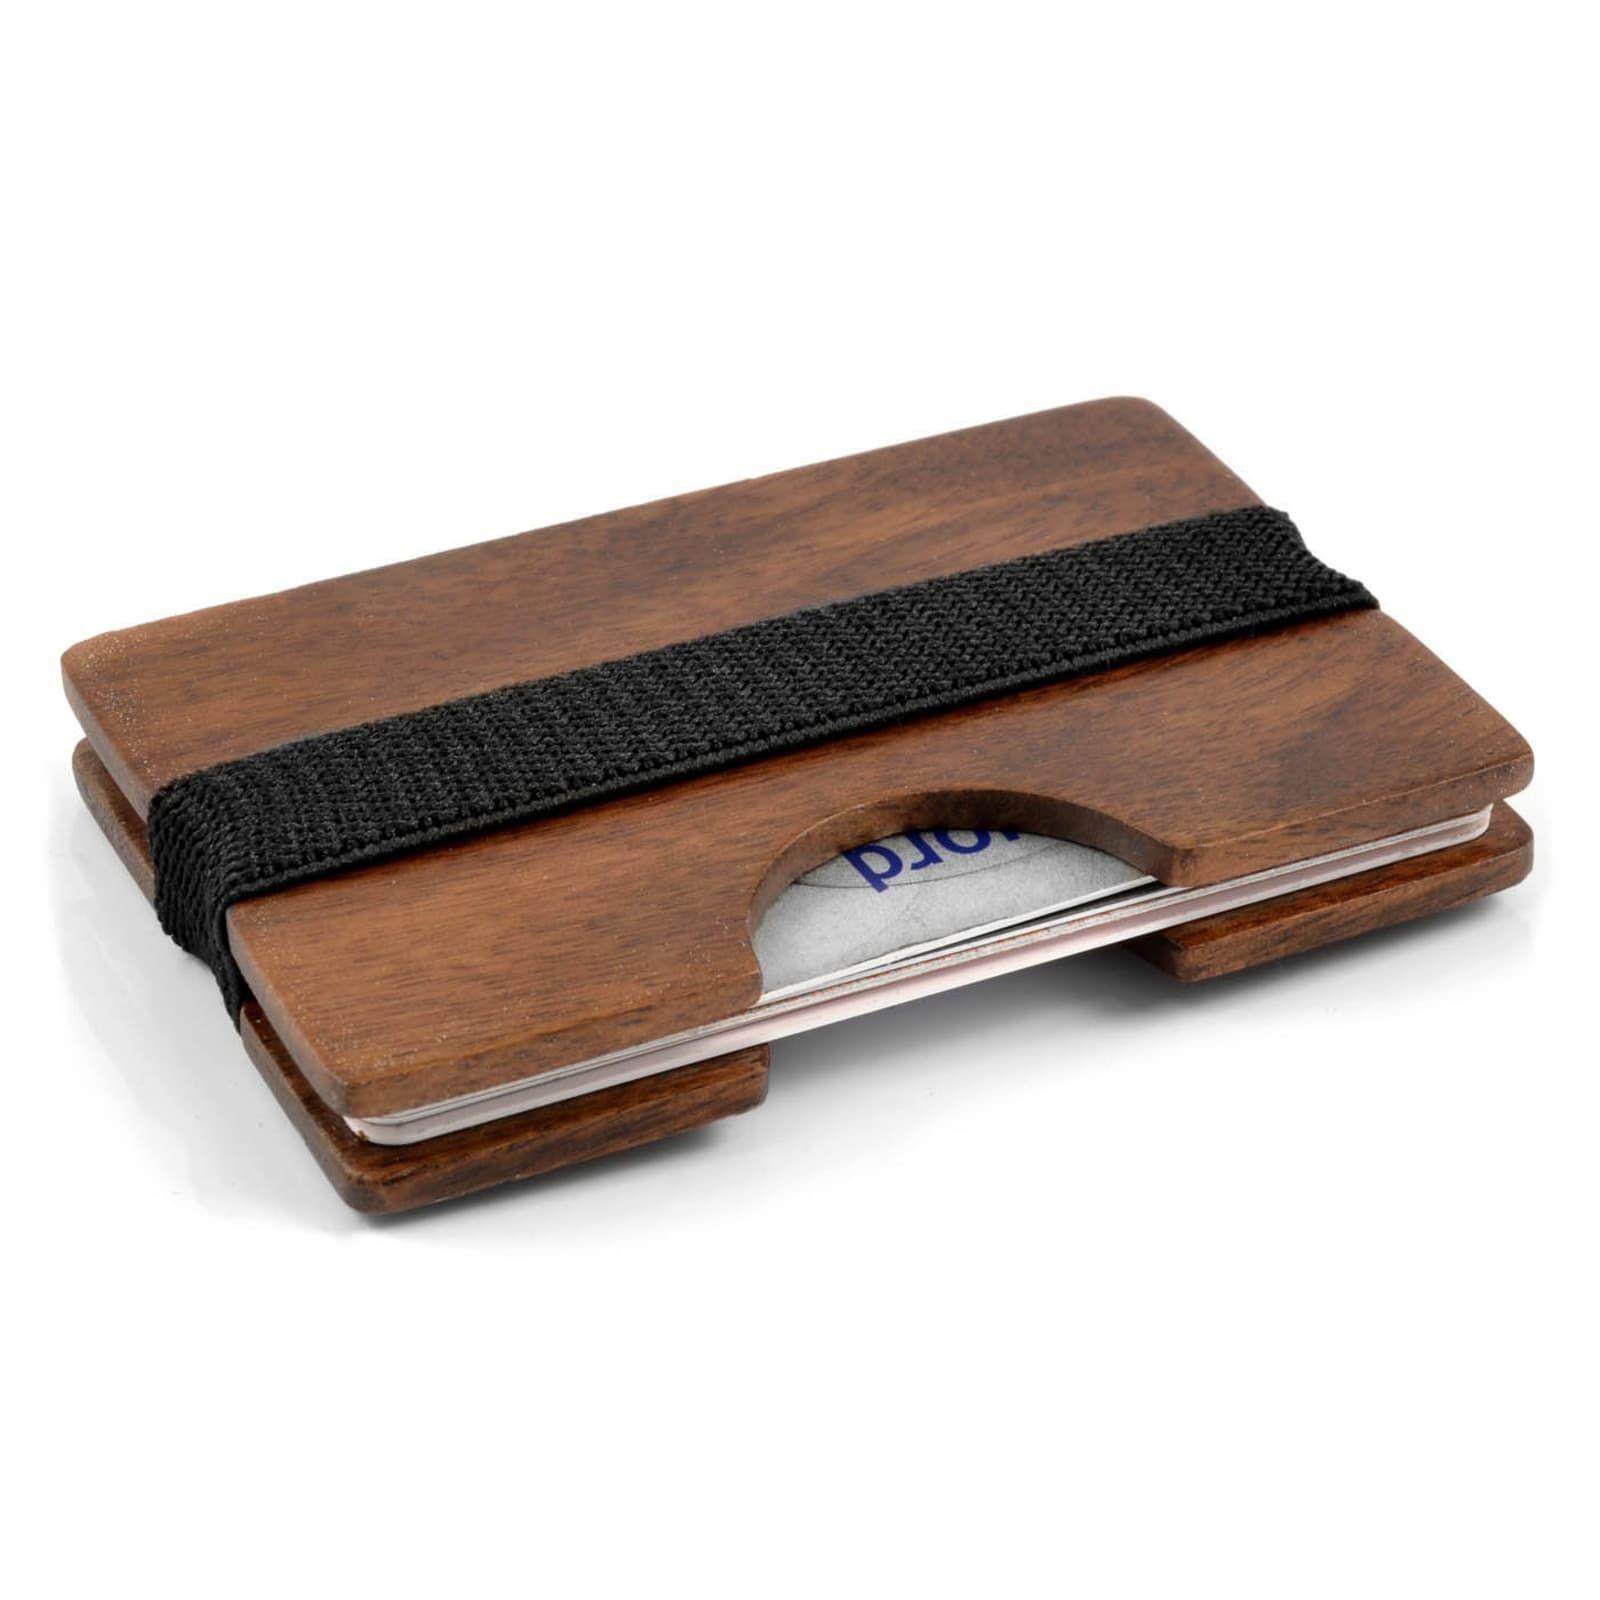 Photo of Walnut Wood Cardholder   In stock!   Collin Rowe